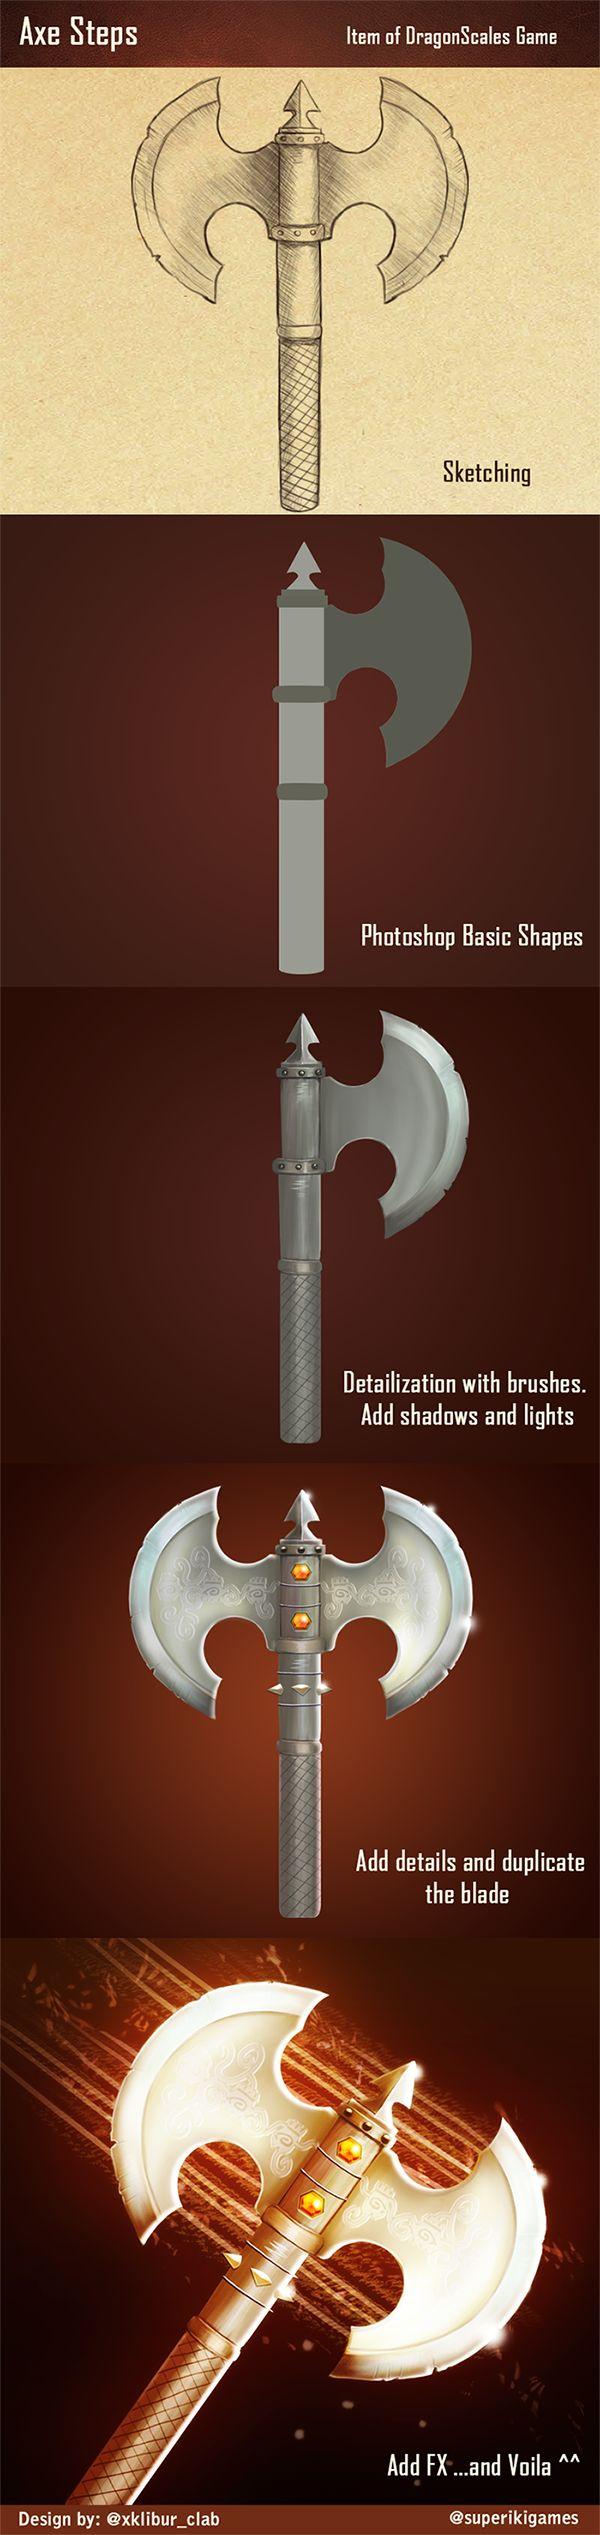 Pasos para dibujar el hacha del videojuego DragonScales: Chambers of the Dragon Whisperer (http://www.ikigames.com/dragonscales-chambers-of-the-dragon-whisperer/)